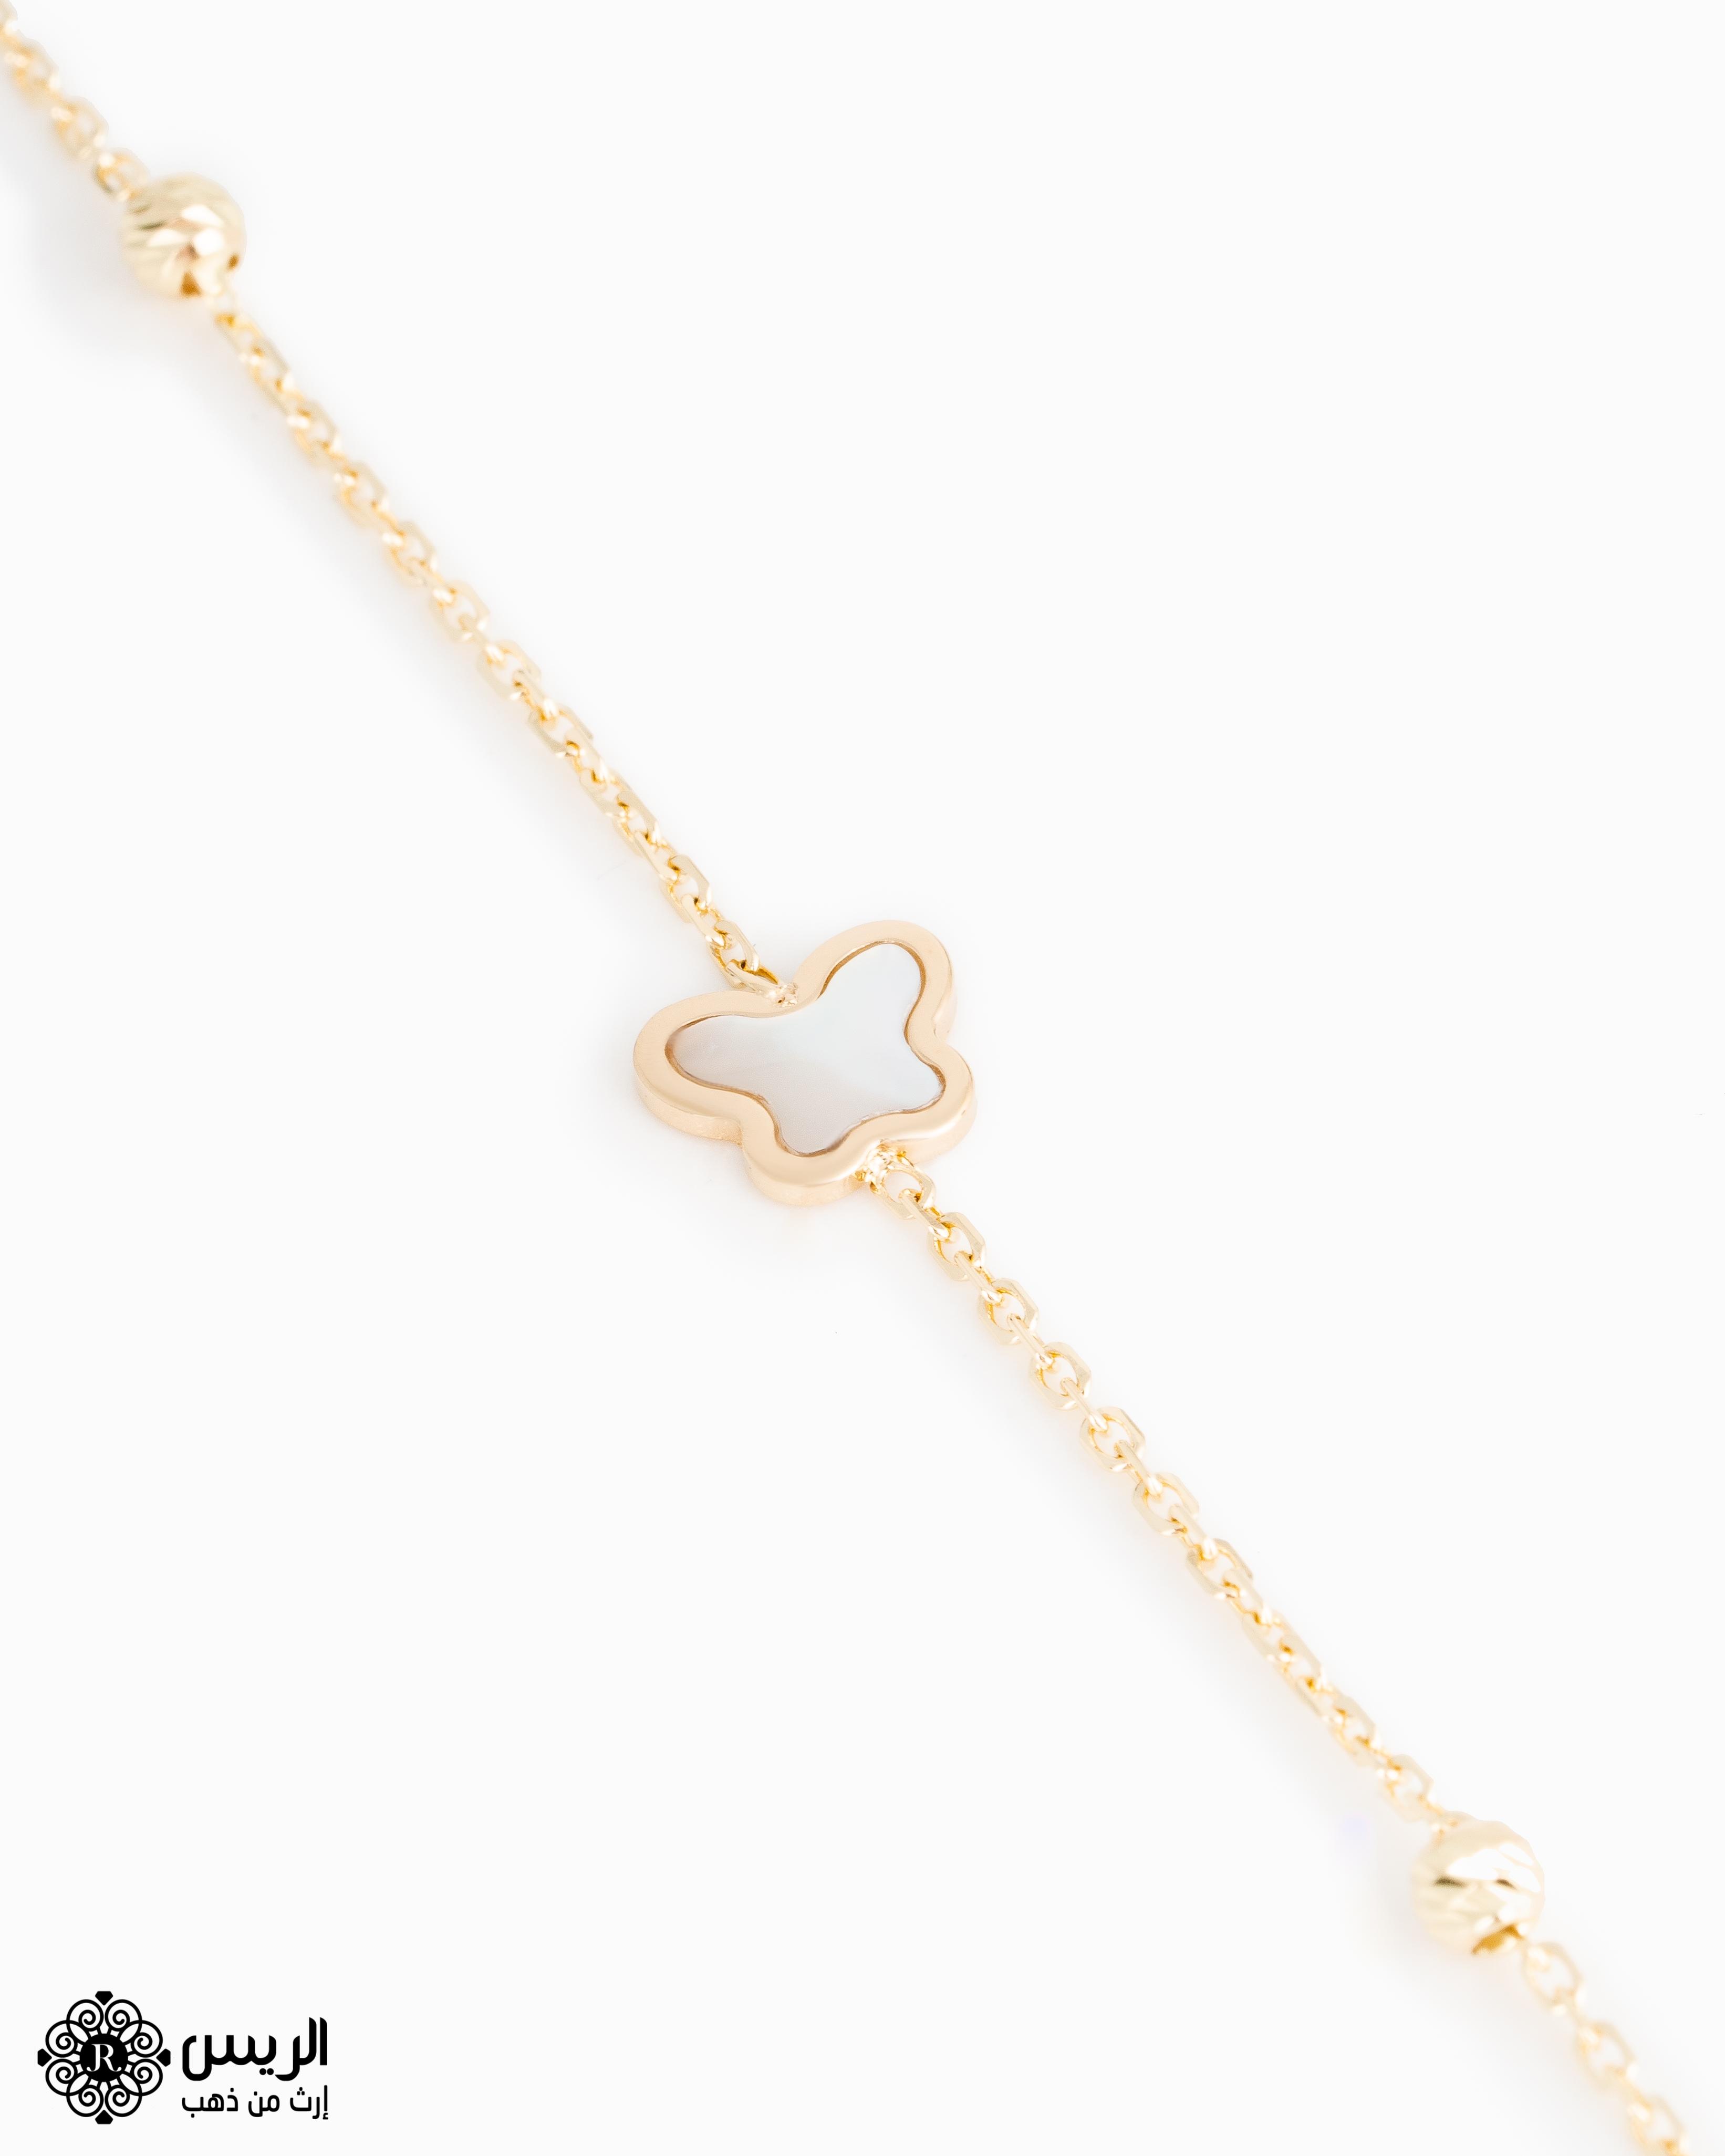 Raies jewelry Delicate Anklet خلخال ناعم الريس للمجوهرات